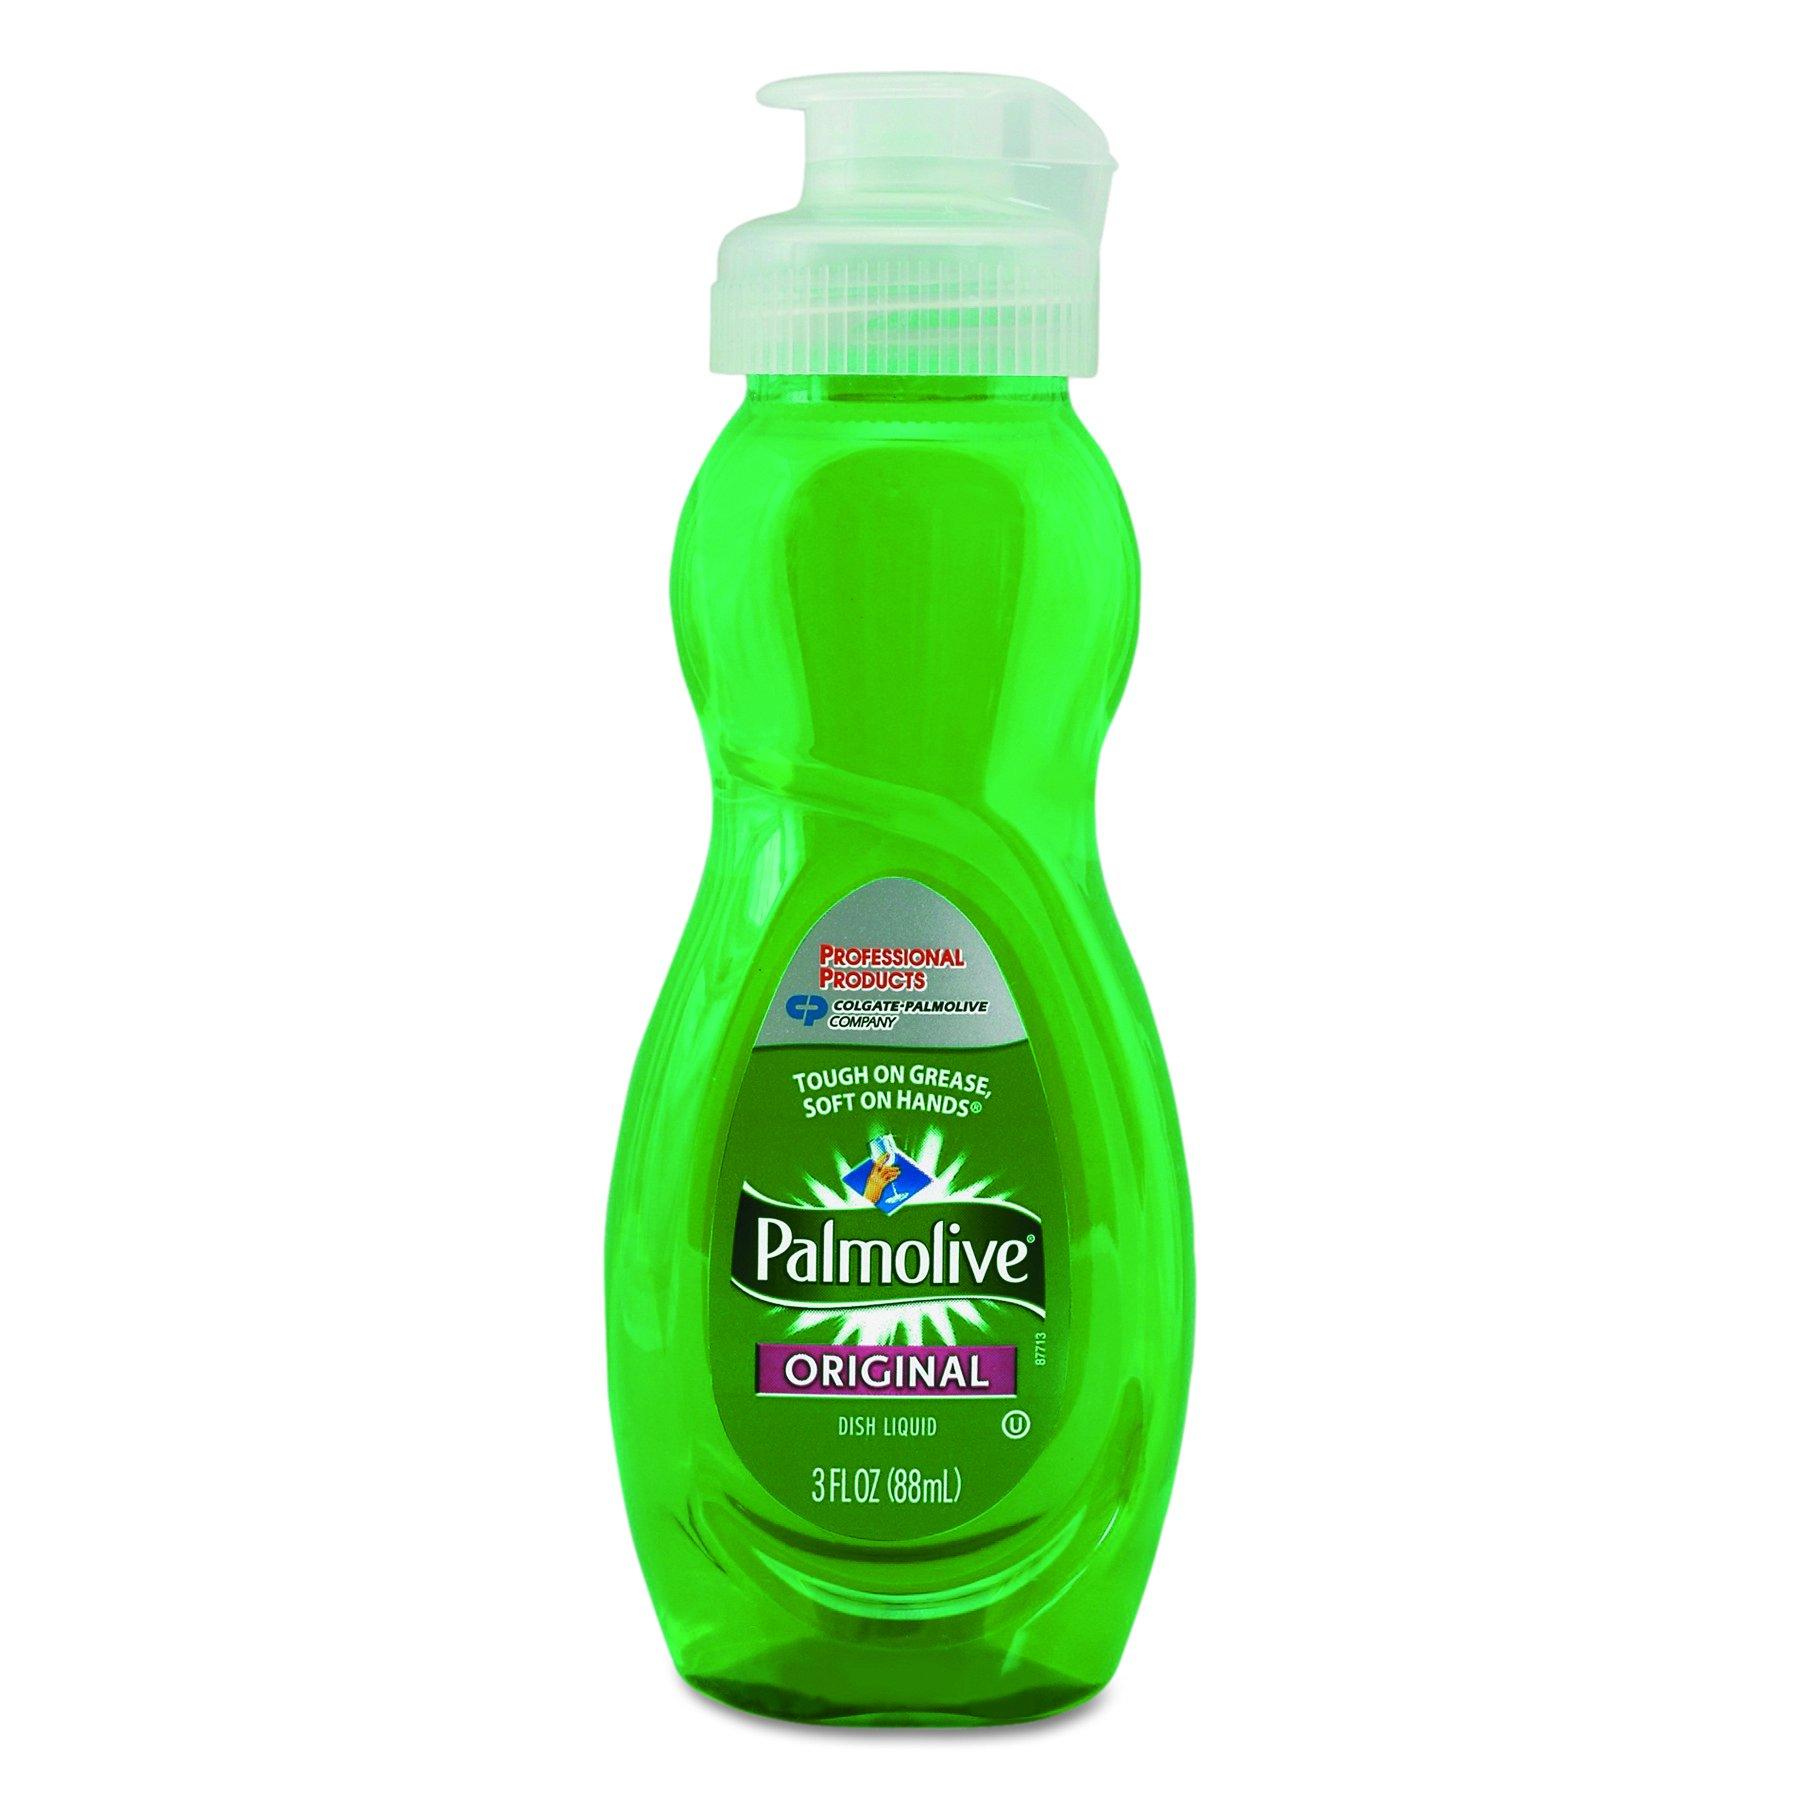 Palmolive 01417 Dishwashing Liquid, Original Scent, 3oz Bottle (Case of 72)